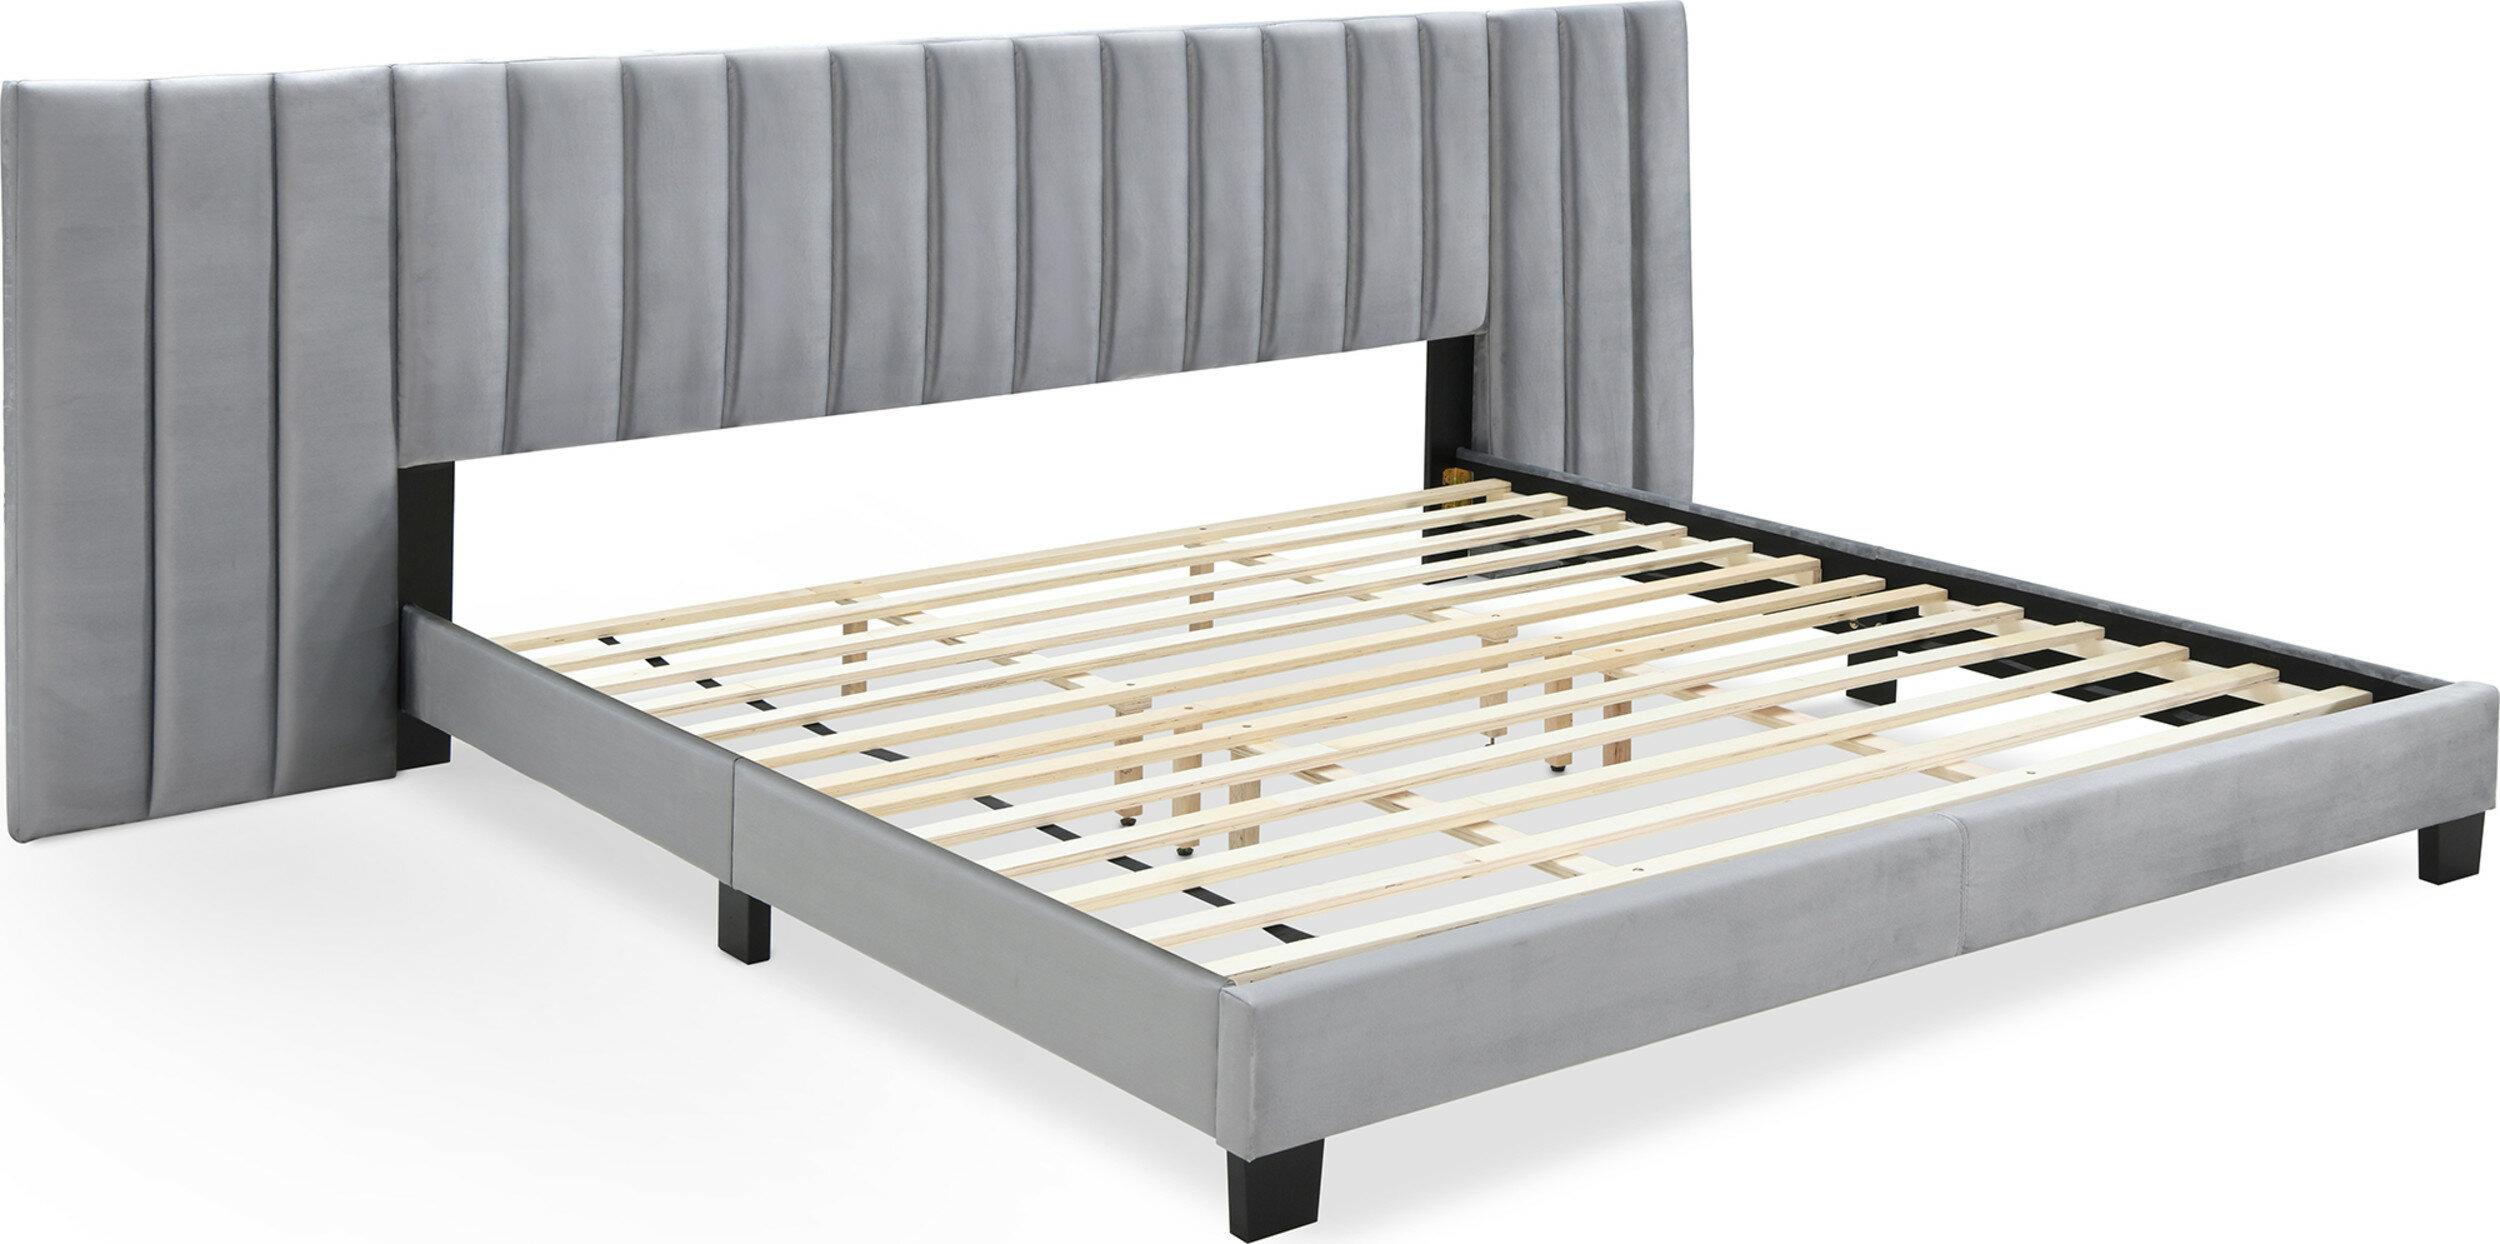 Rosdorf Park Mccaskill Gramercy Channel Tuftedupholstered Platform Bed Reviews Wayfair